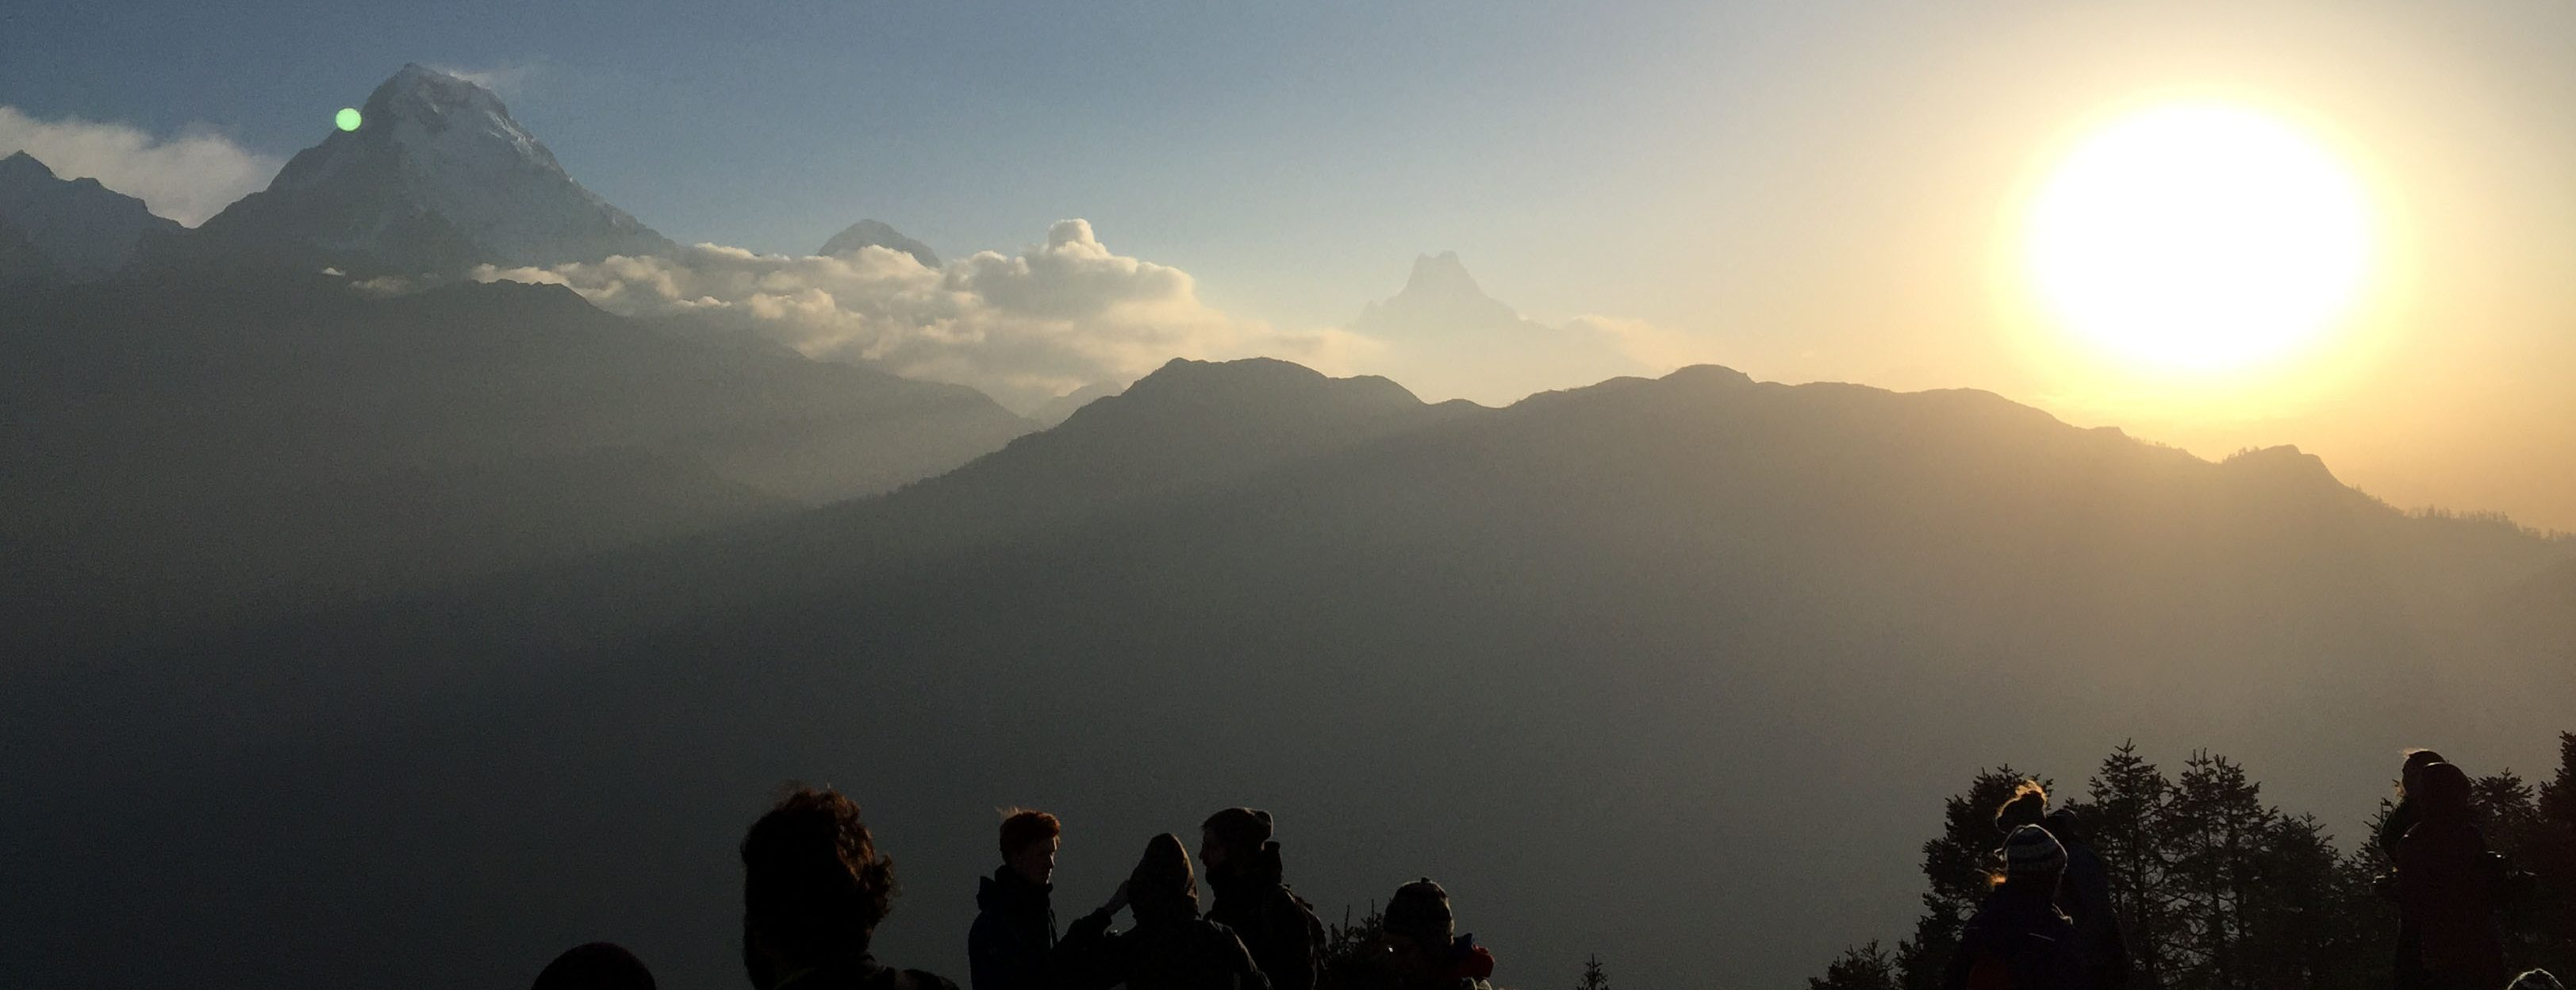 Annapurna inner circuit trek